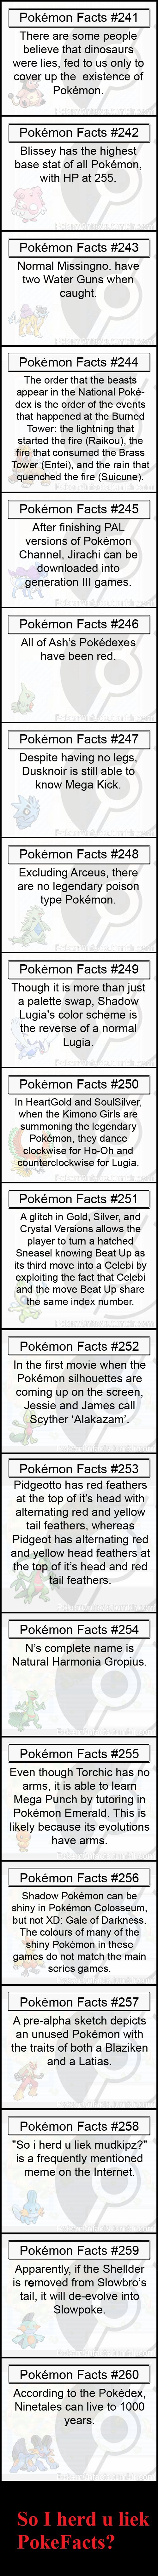 Pokemon Facts 13